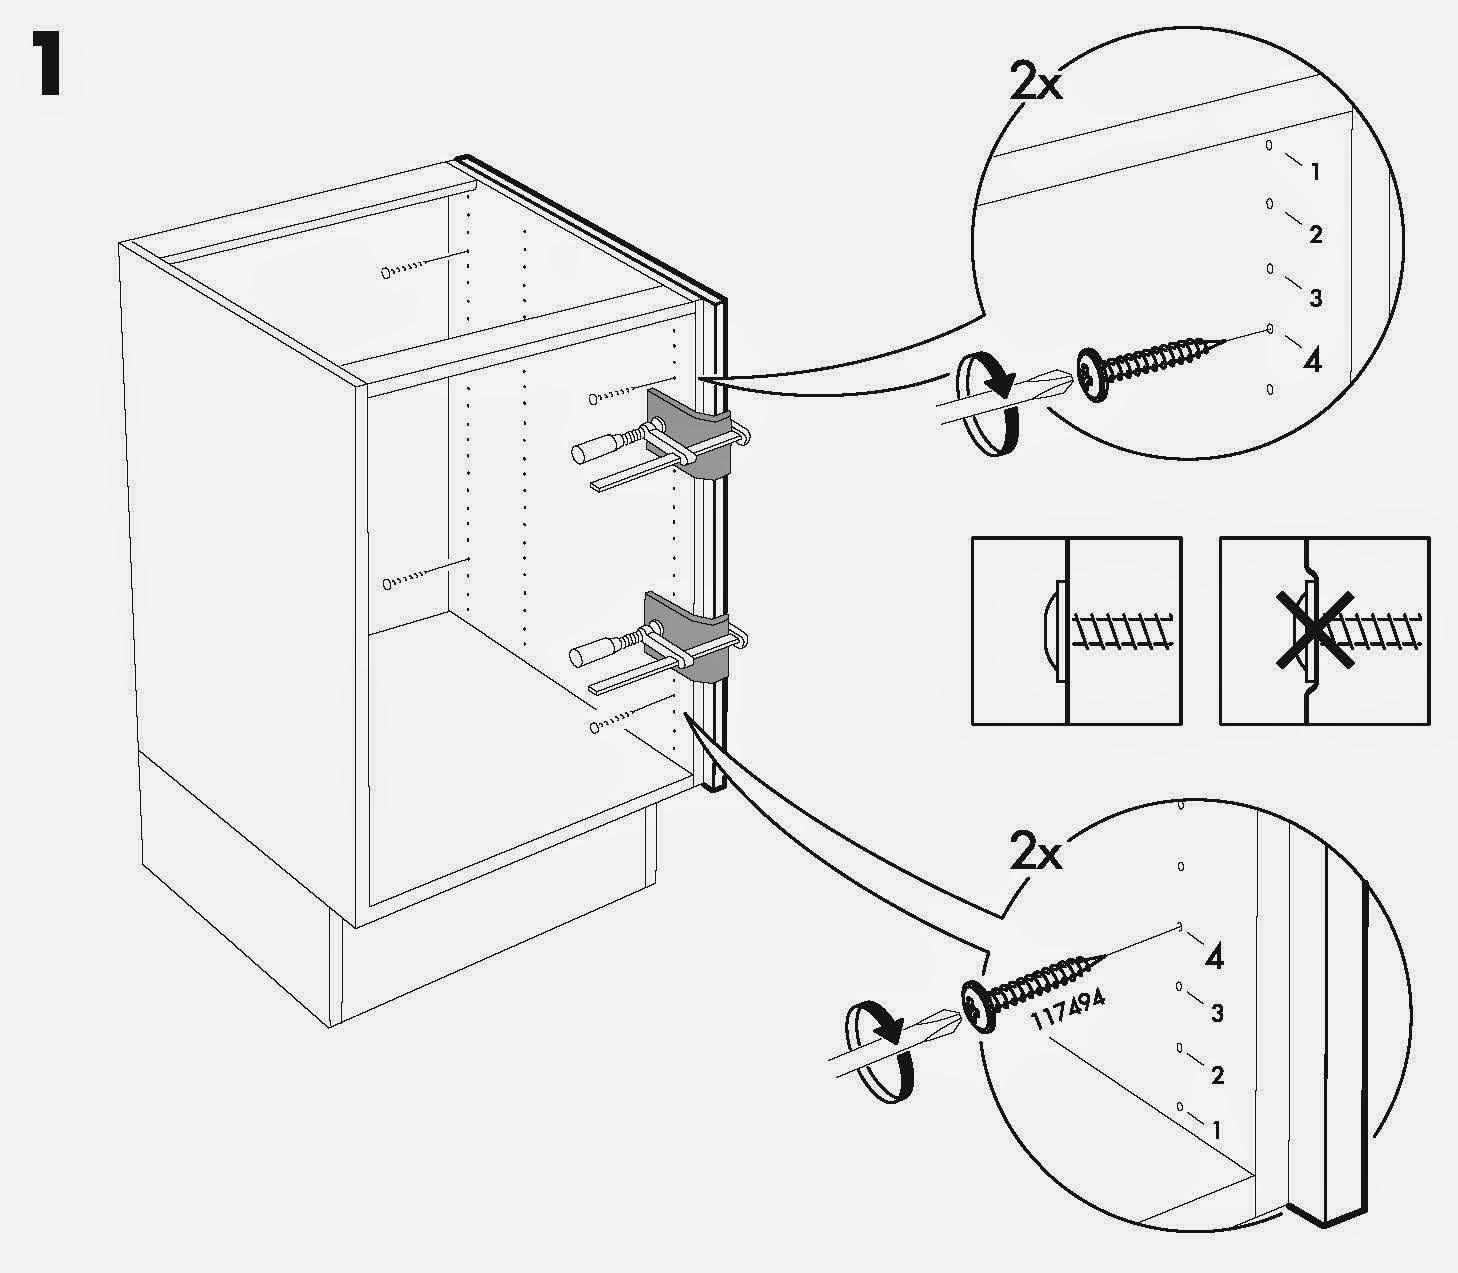 Cabinet Detail Drawing At GetDrawings.com